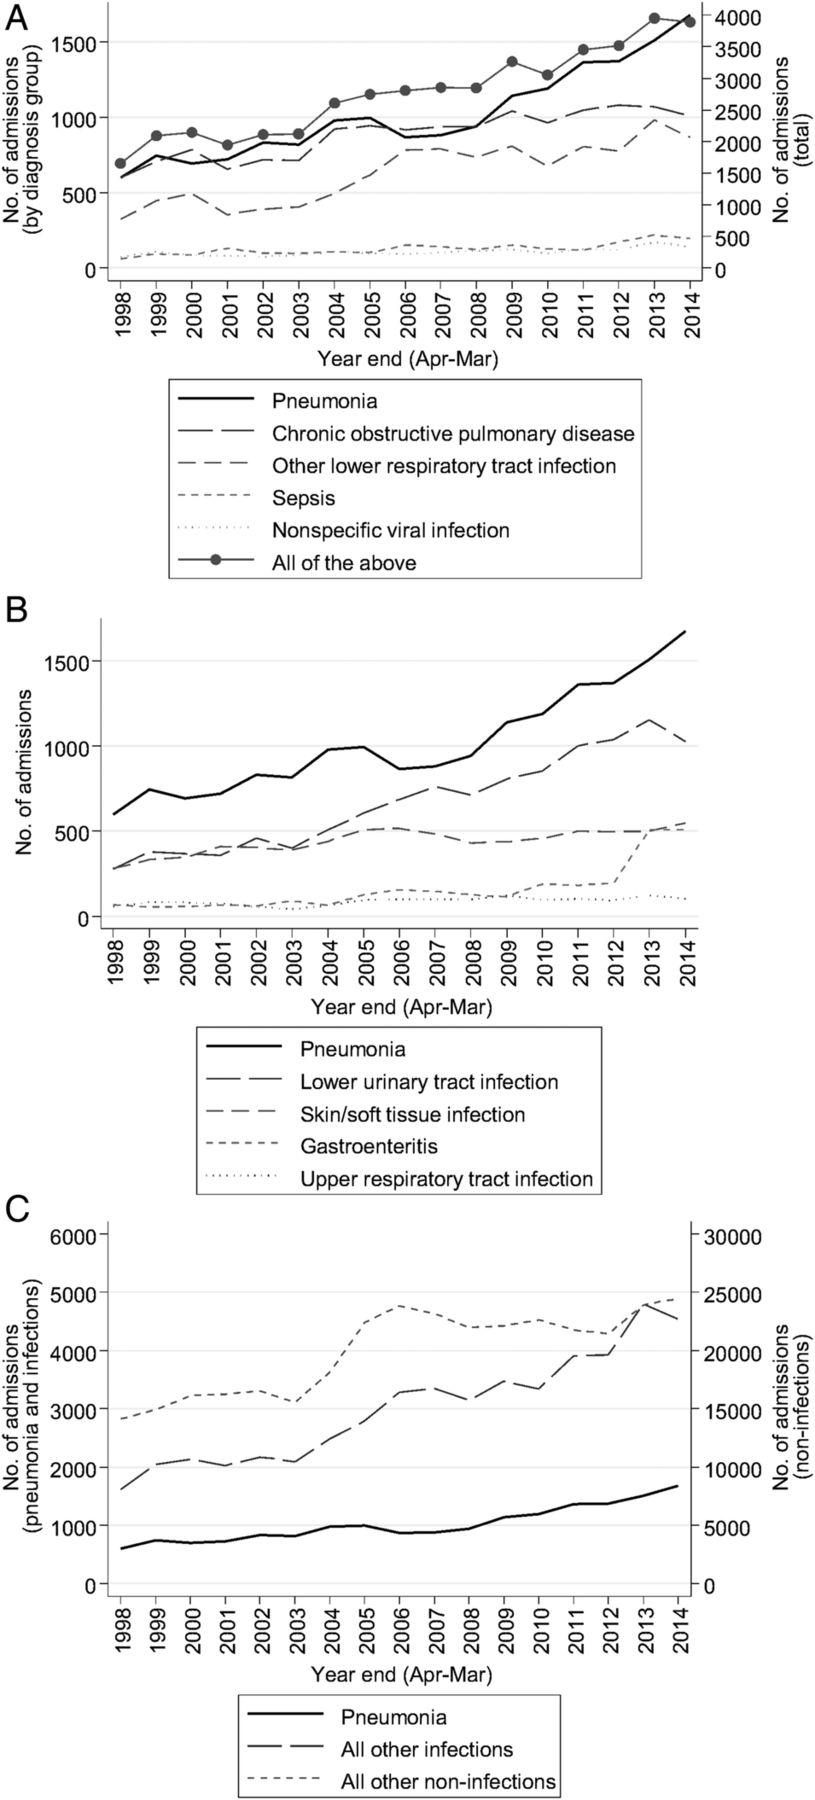 Increasing burden of community-acquired pneumonia leading to